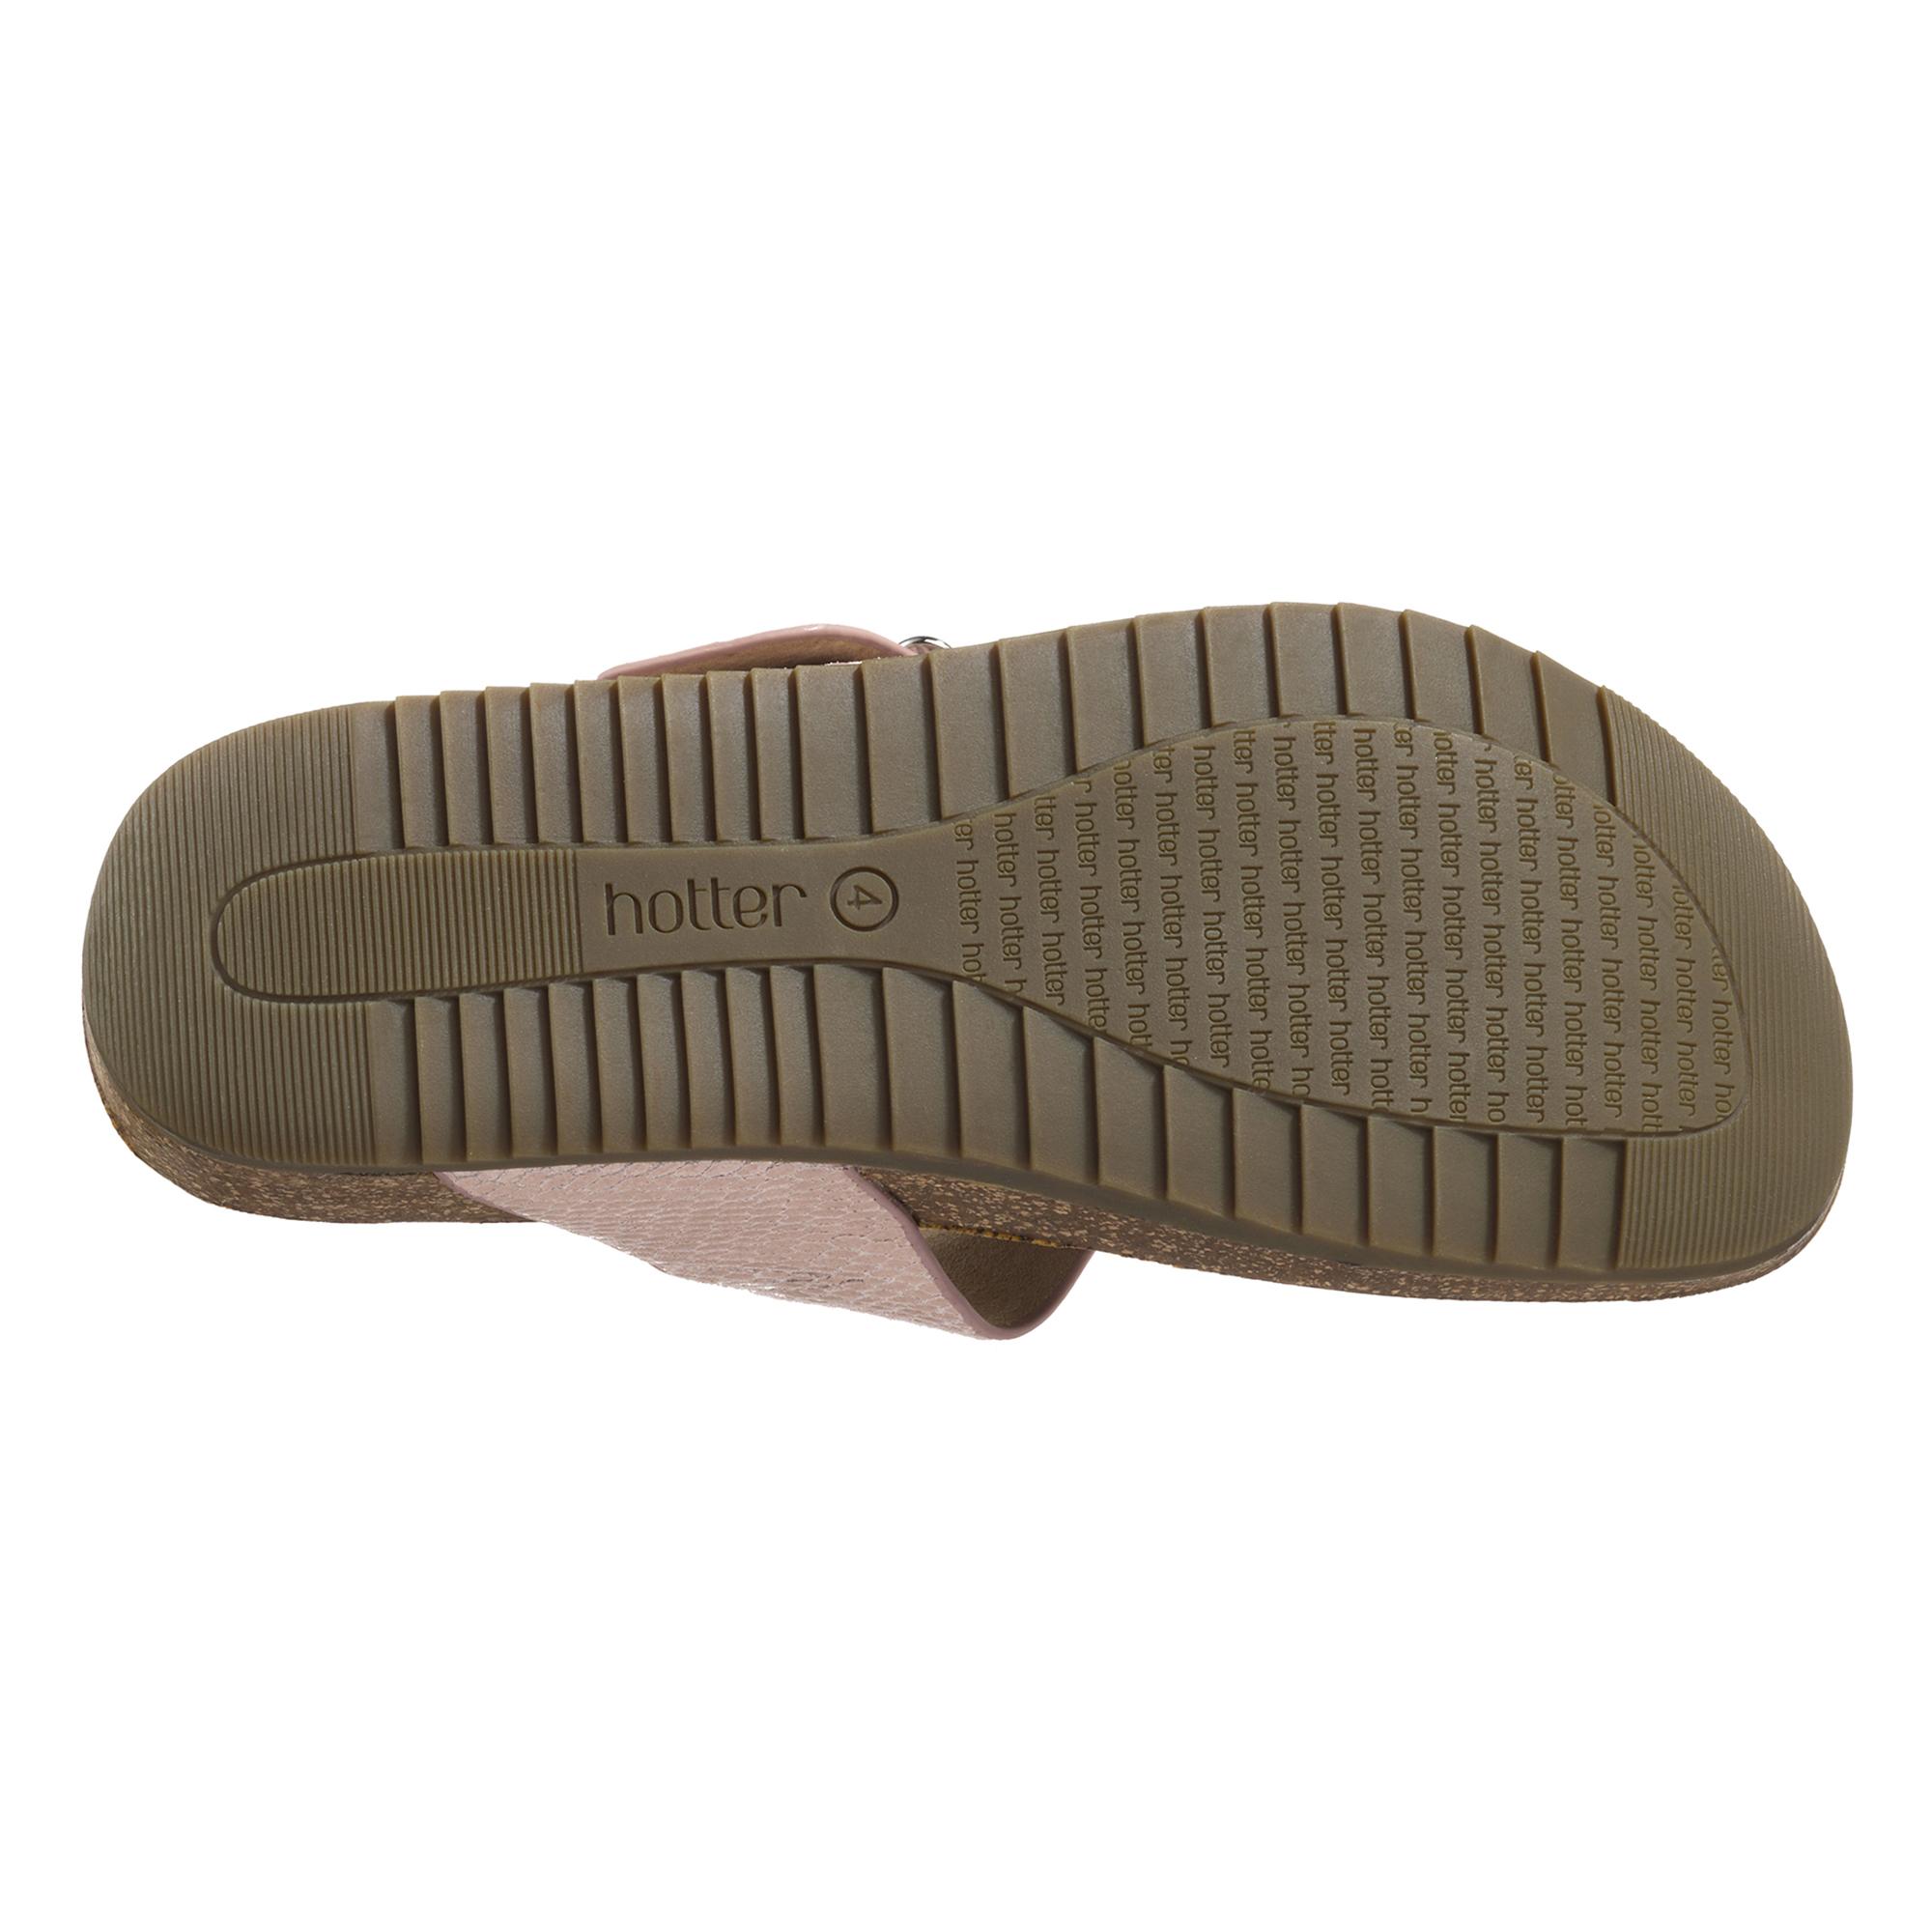 Hotter-Mujer-Resort-Senora-Toe-Post-Sandalias-Verano-Calzado-Casual-Cuero-Textil